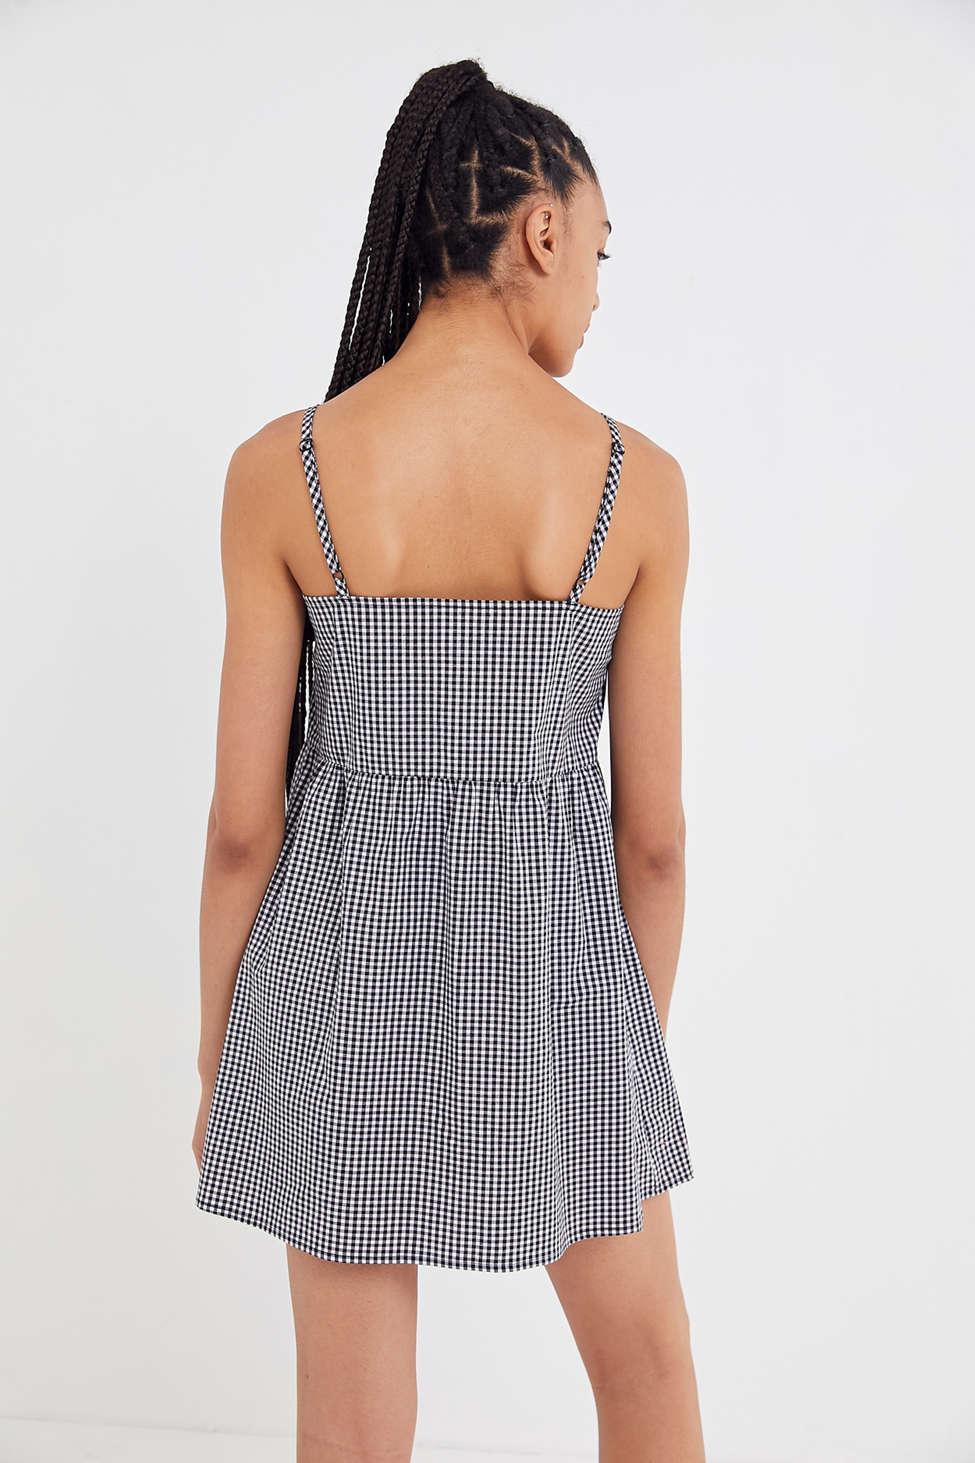 Urban Renewal Remnants Gingham Sleeveless Babydoll Dress by Urban Renewal